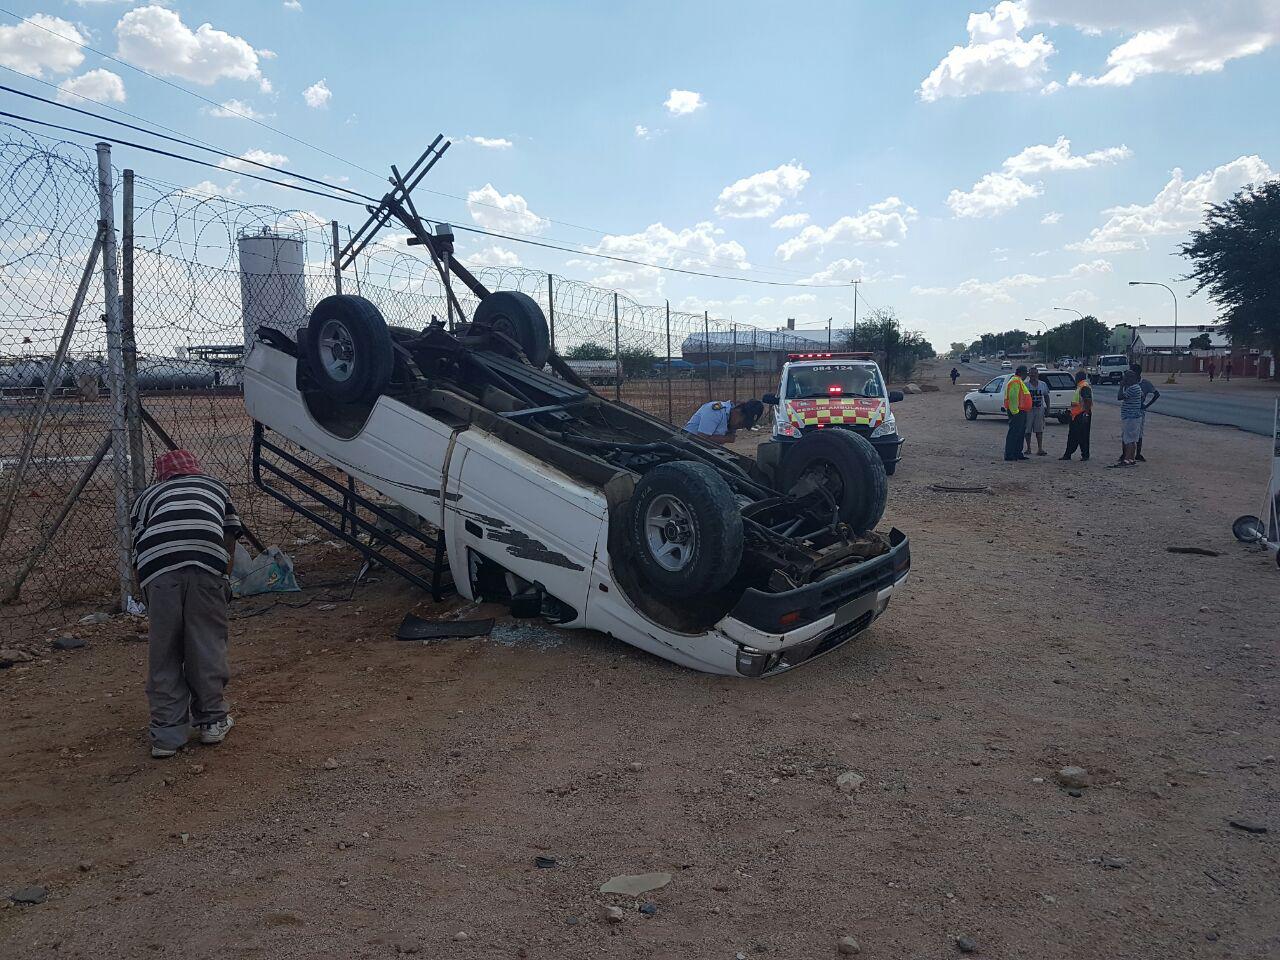 Bakkie overturns leaving three injured, Upington